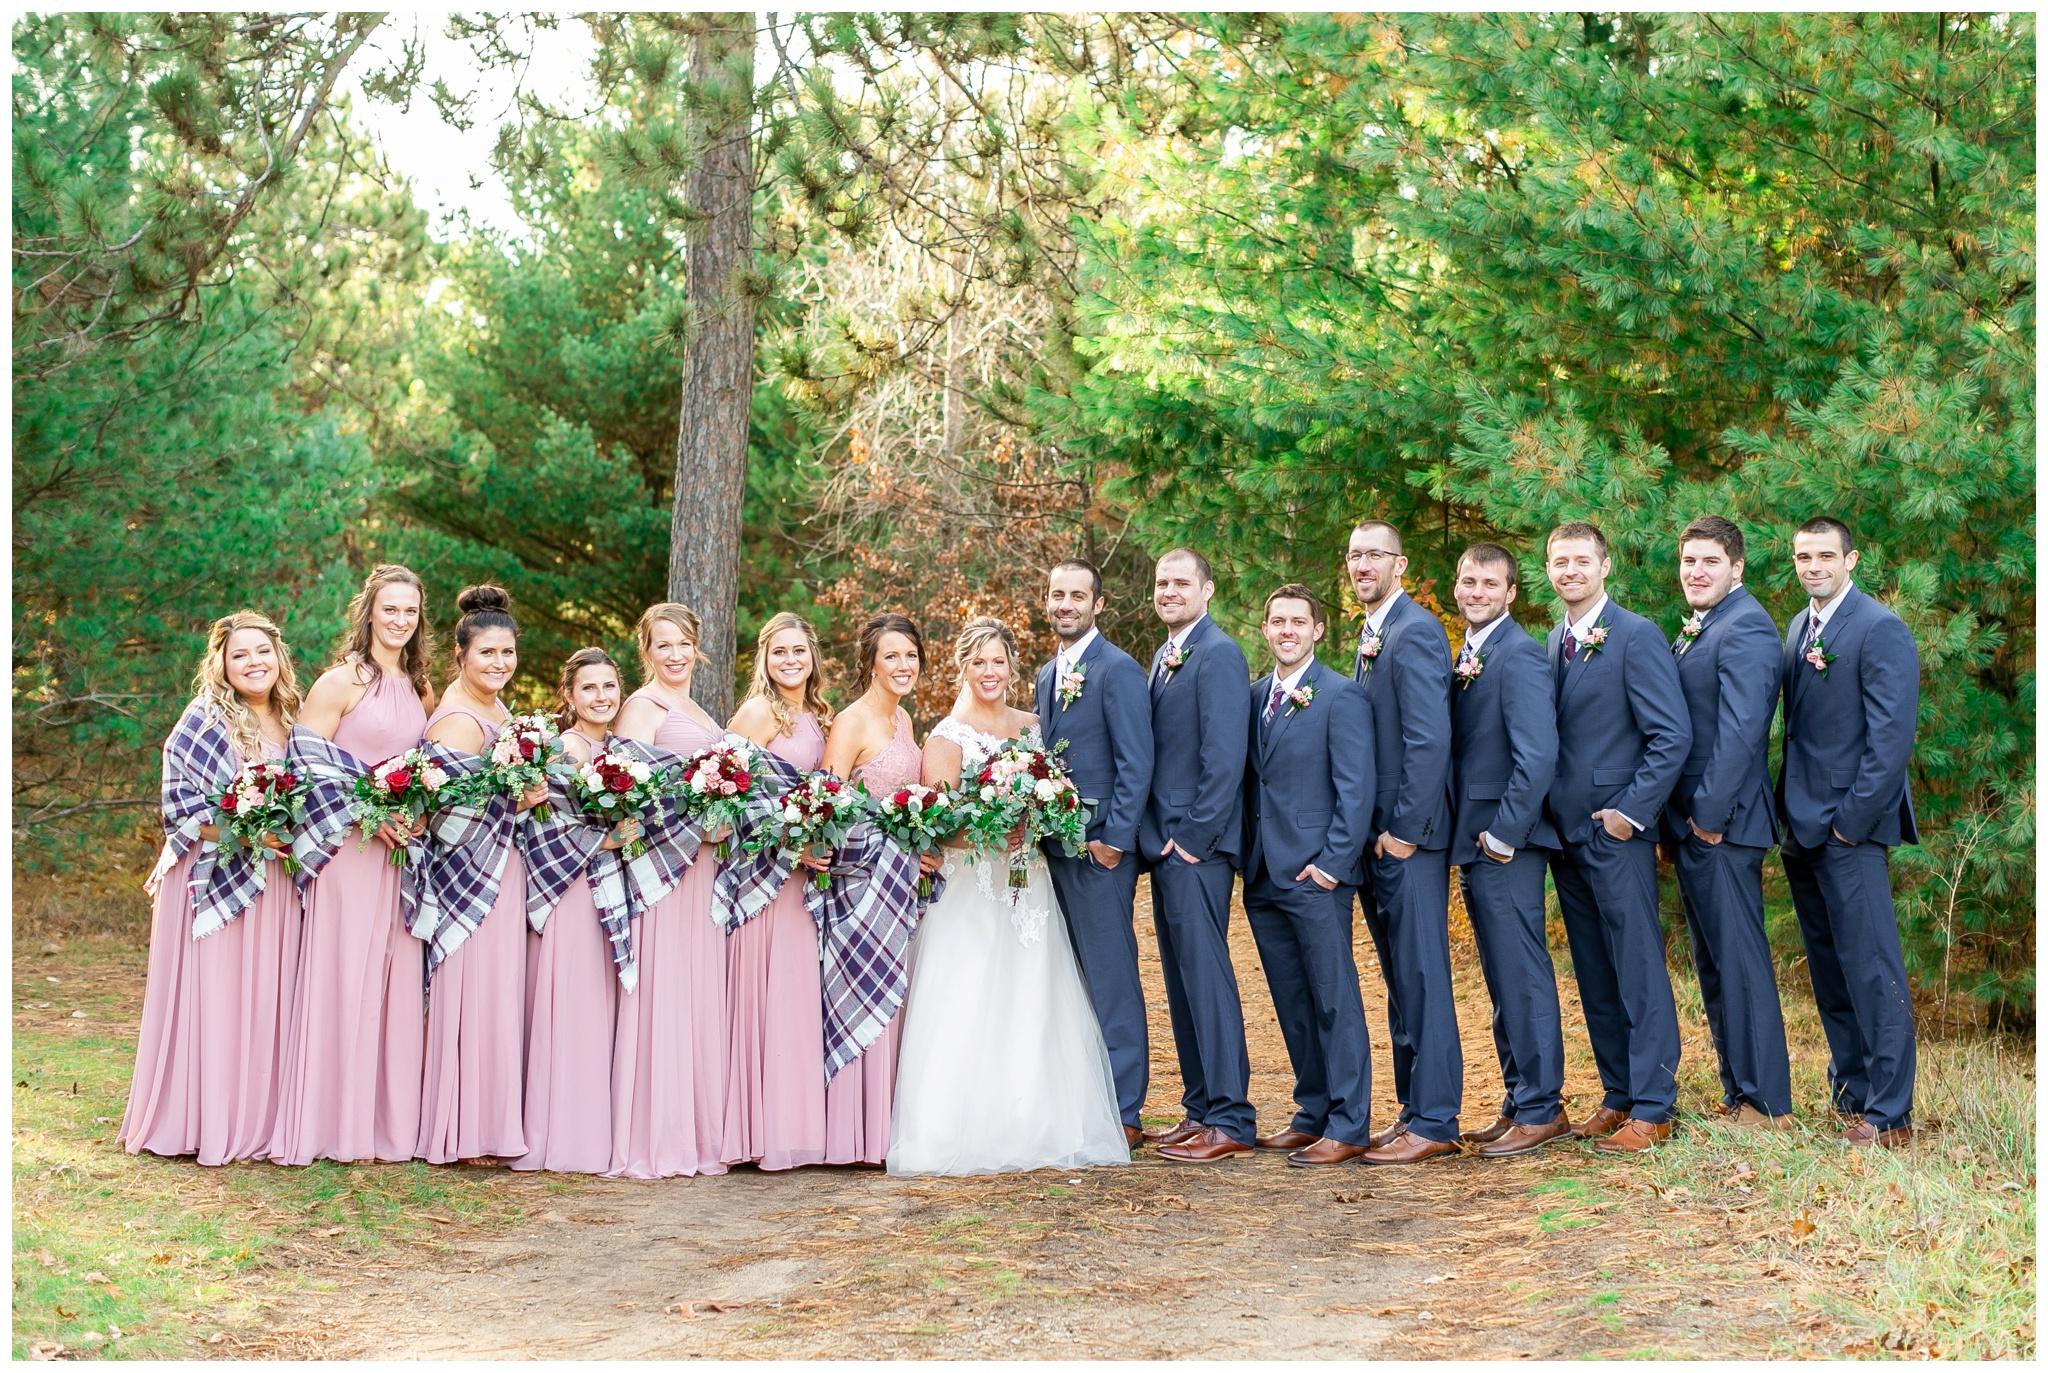 Shawano_County_park_Wedding_Caynay_Photo_Madison_Wi_2306.jpg